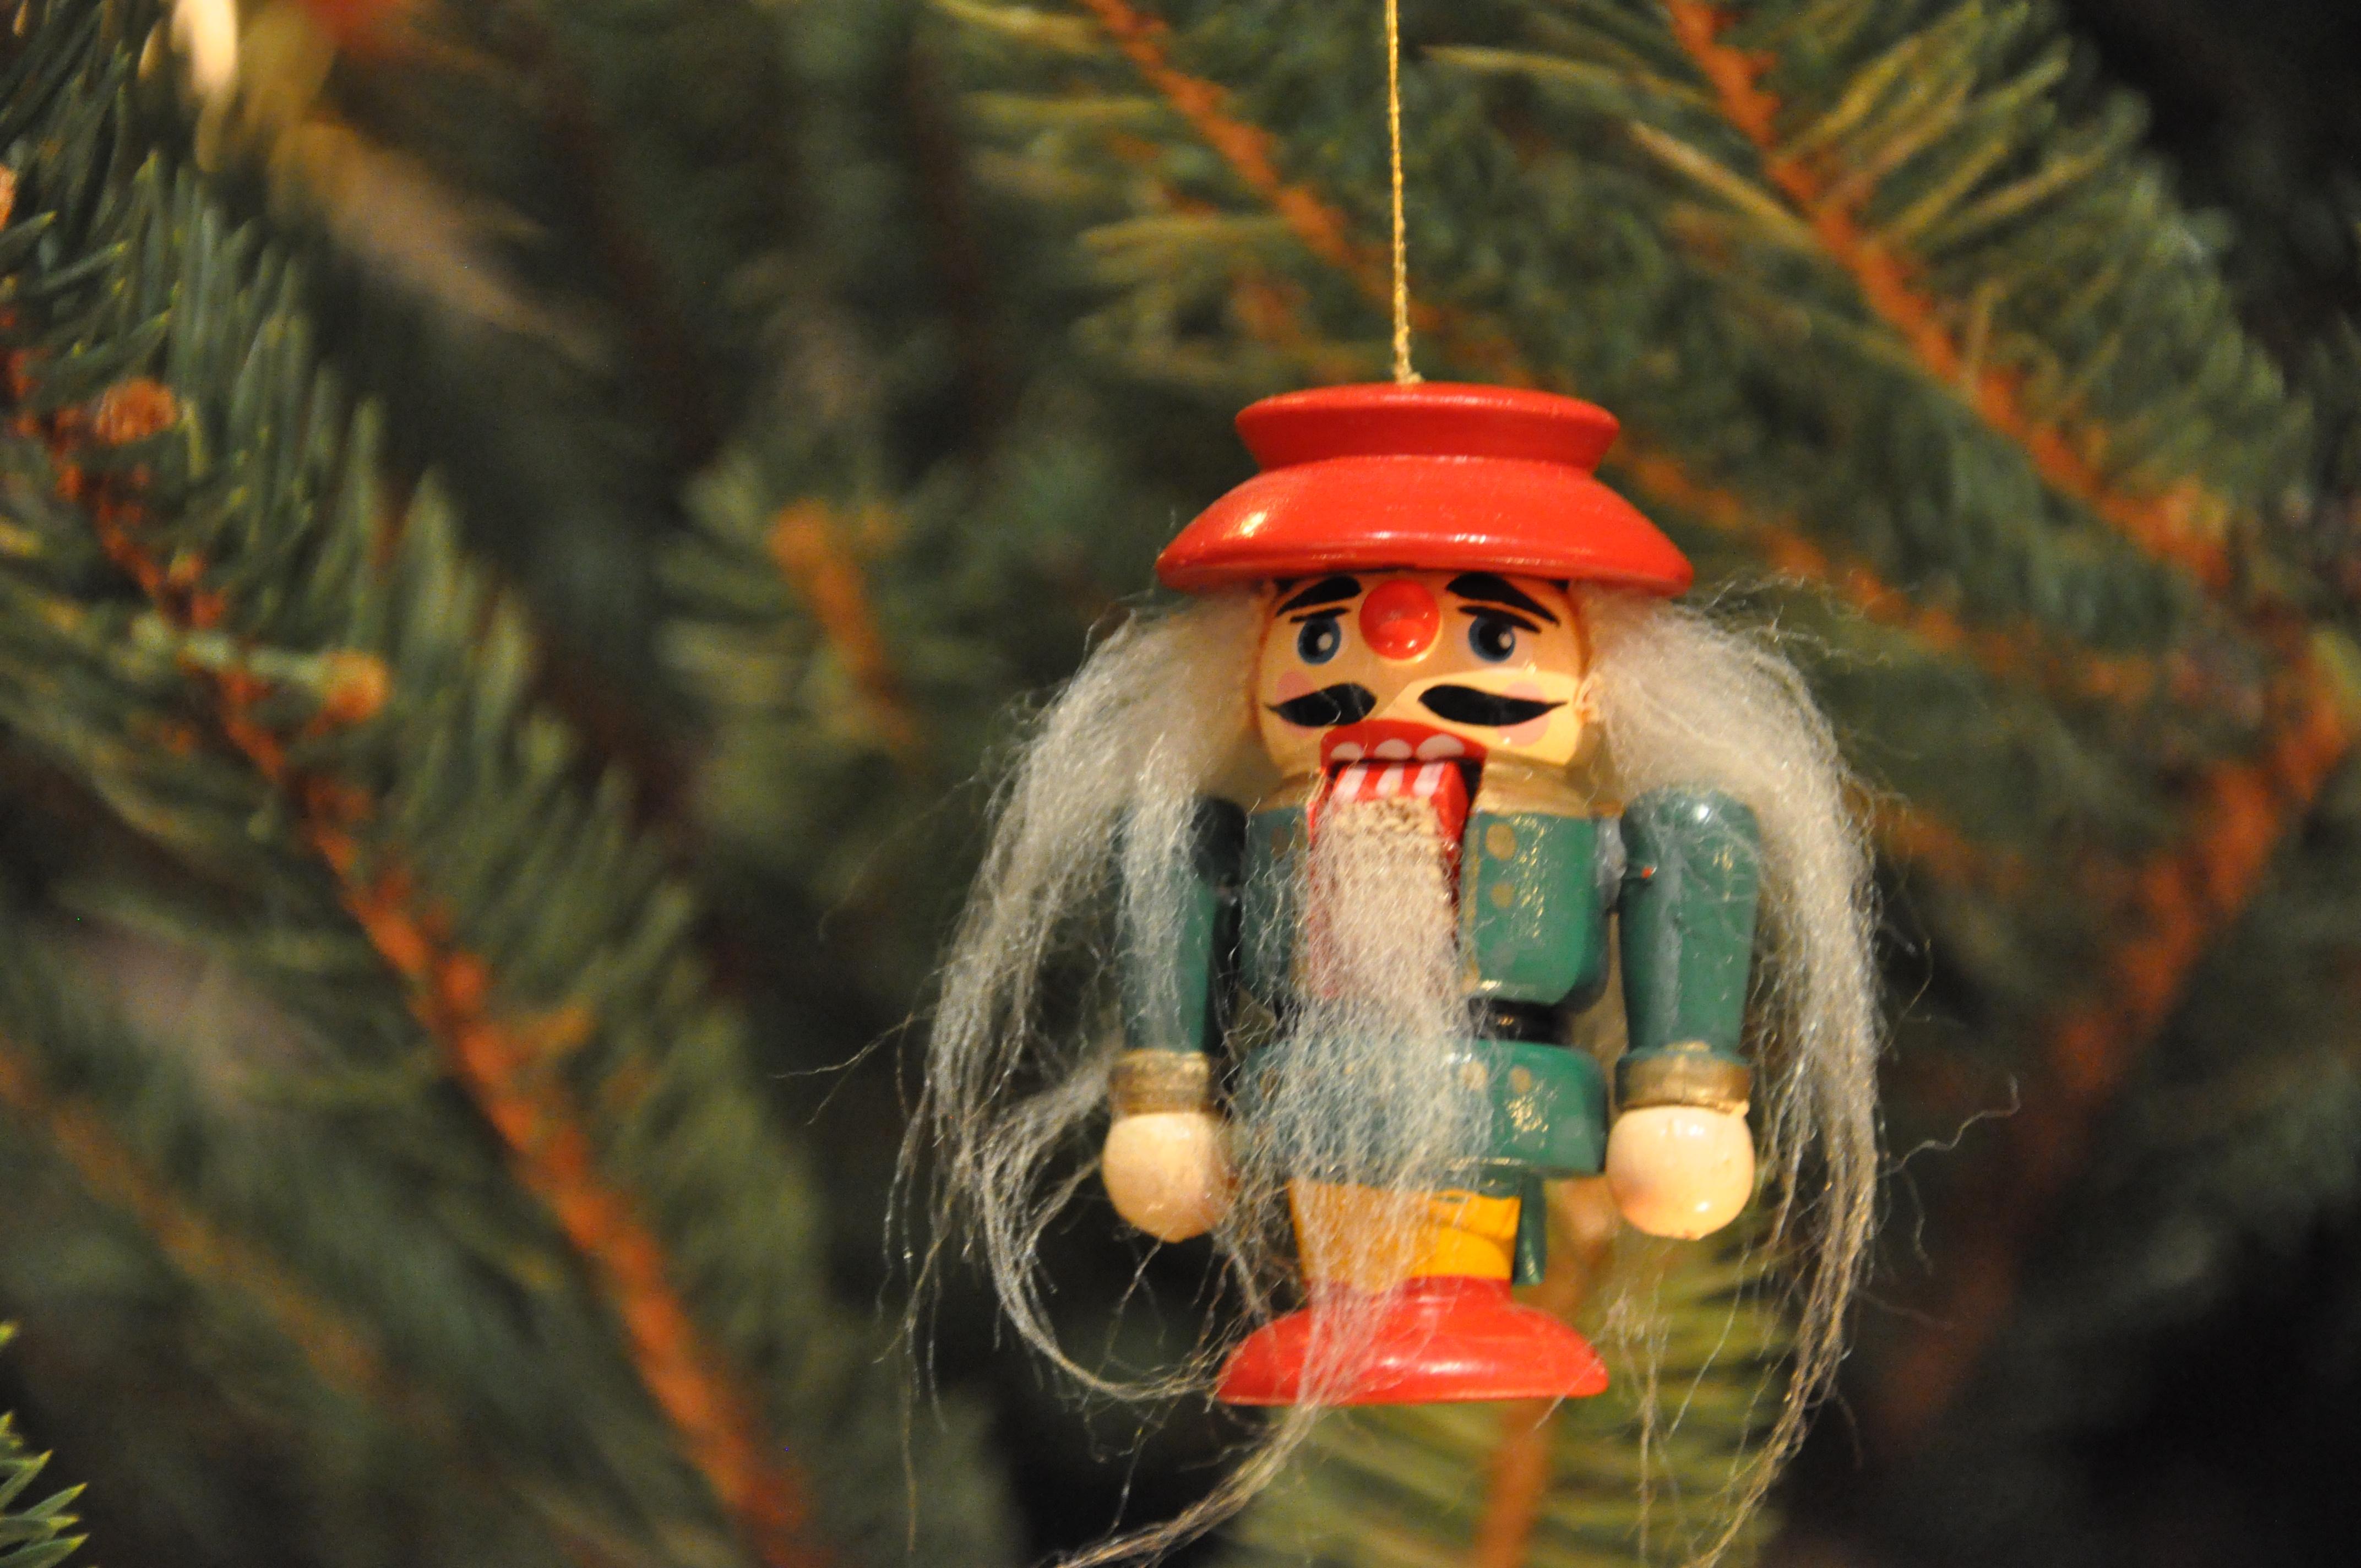 File:Nutcracker christmas ornament.JPG - Wikimedia Commons